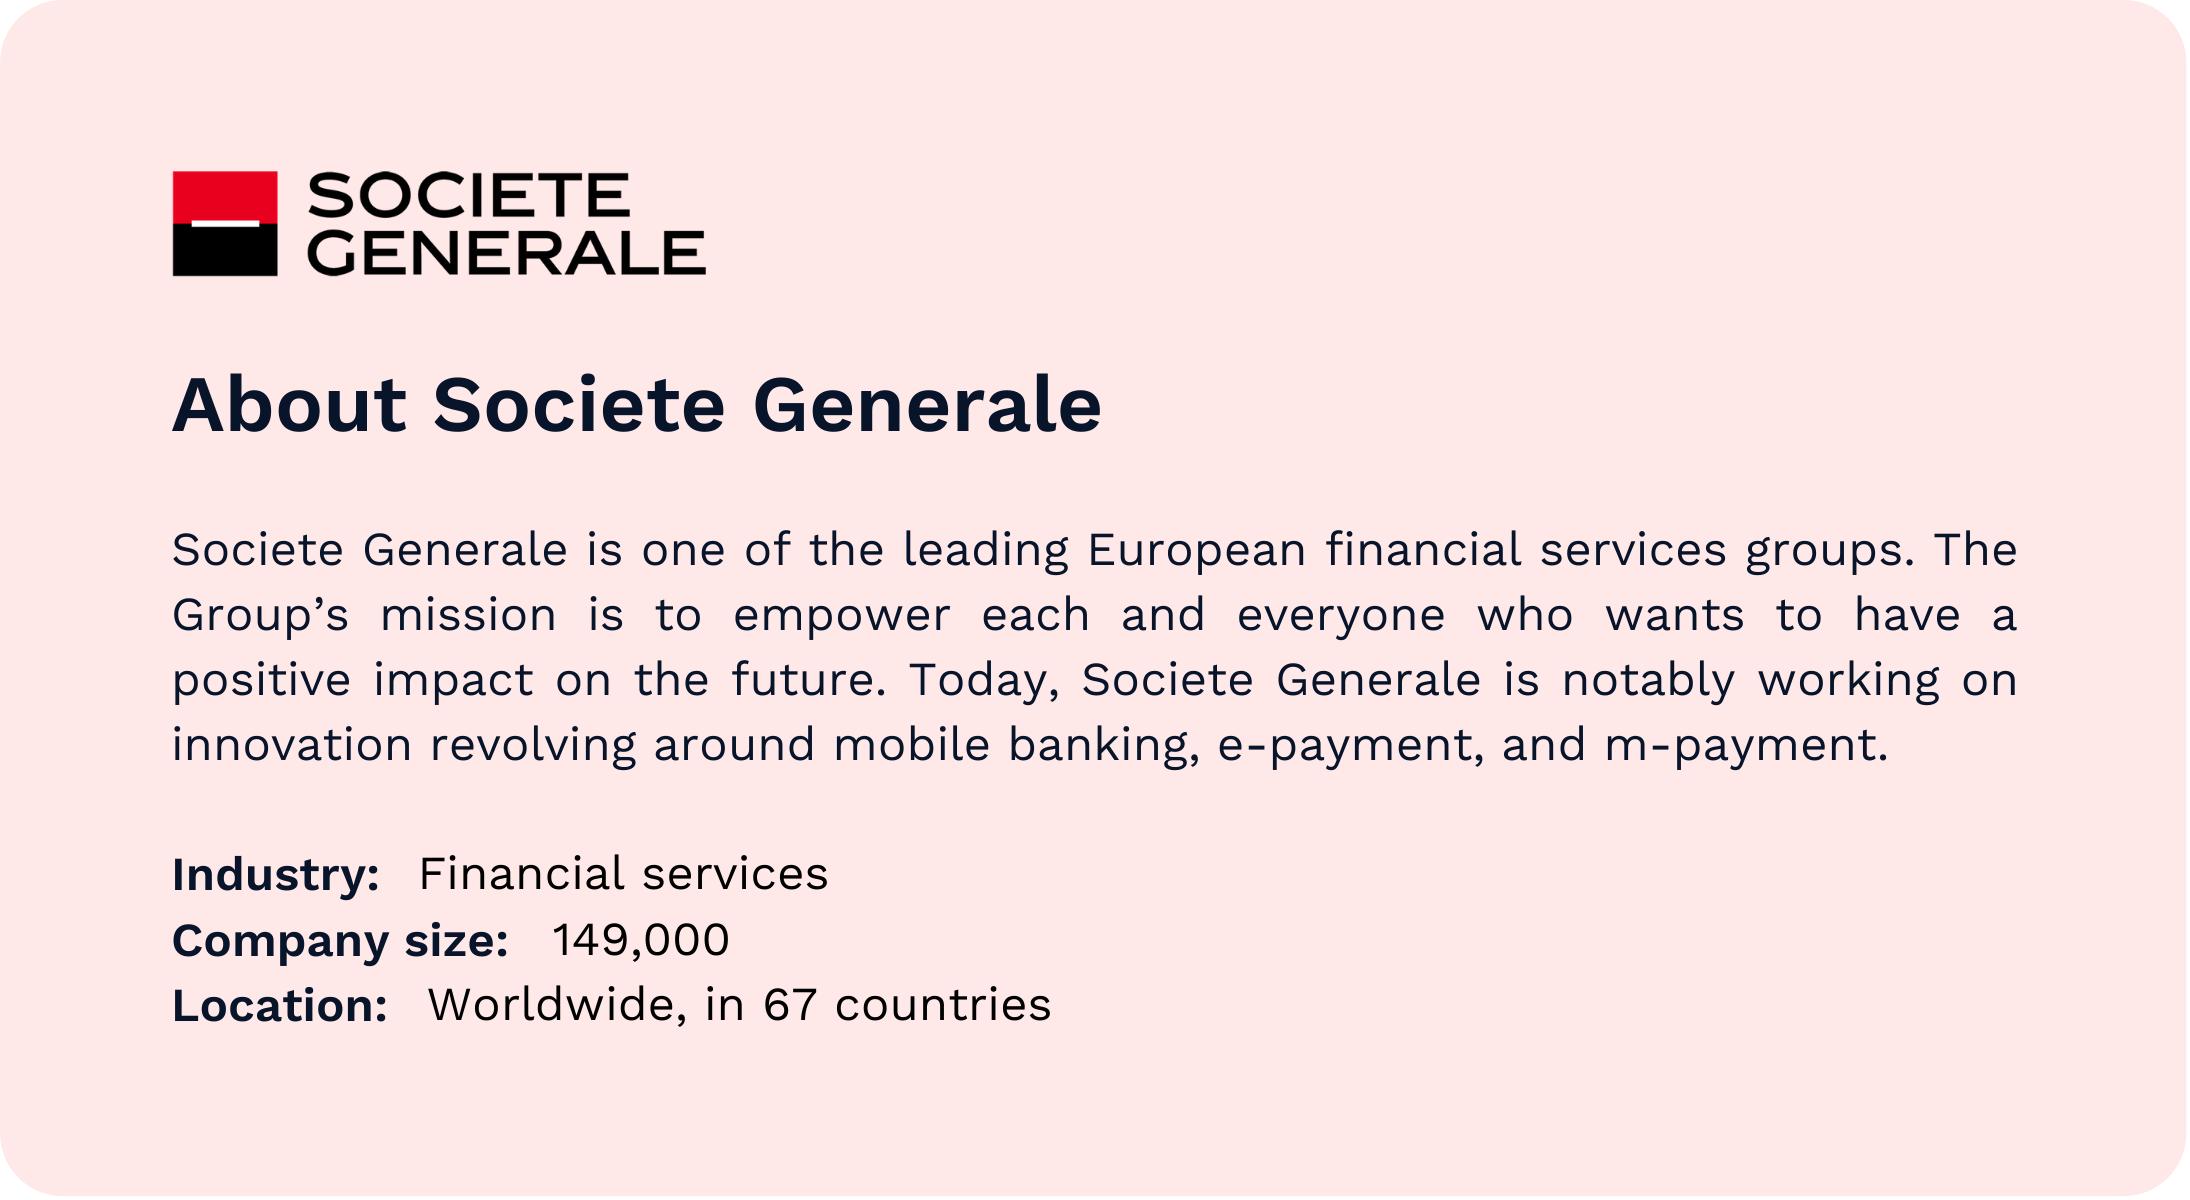 About Societe Generale